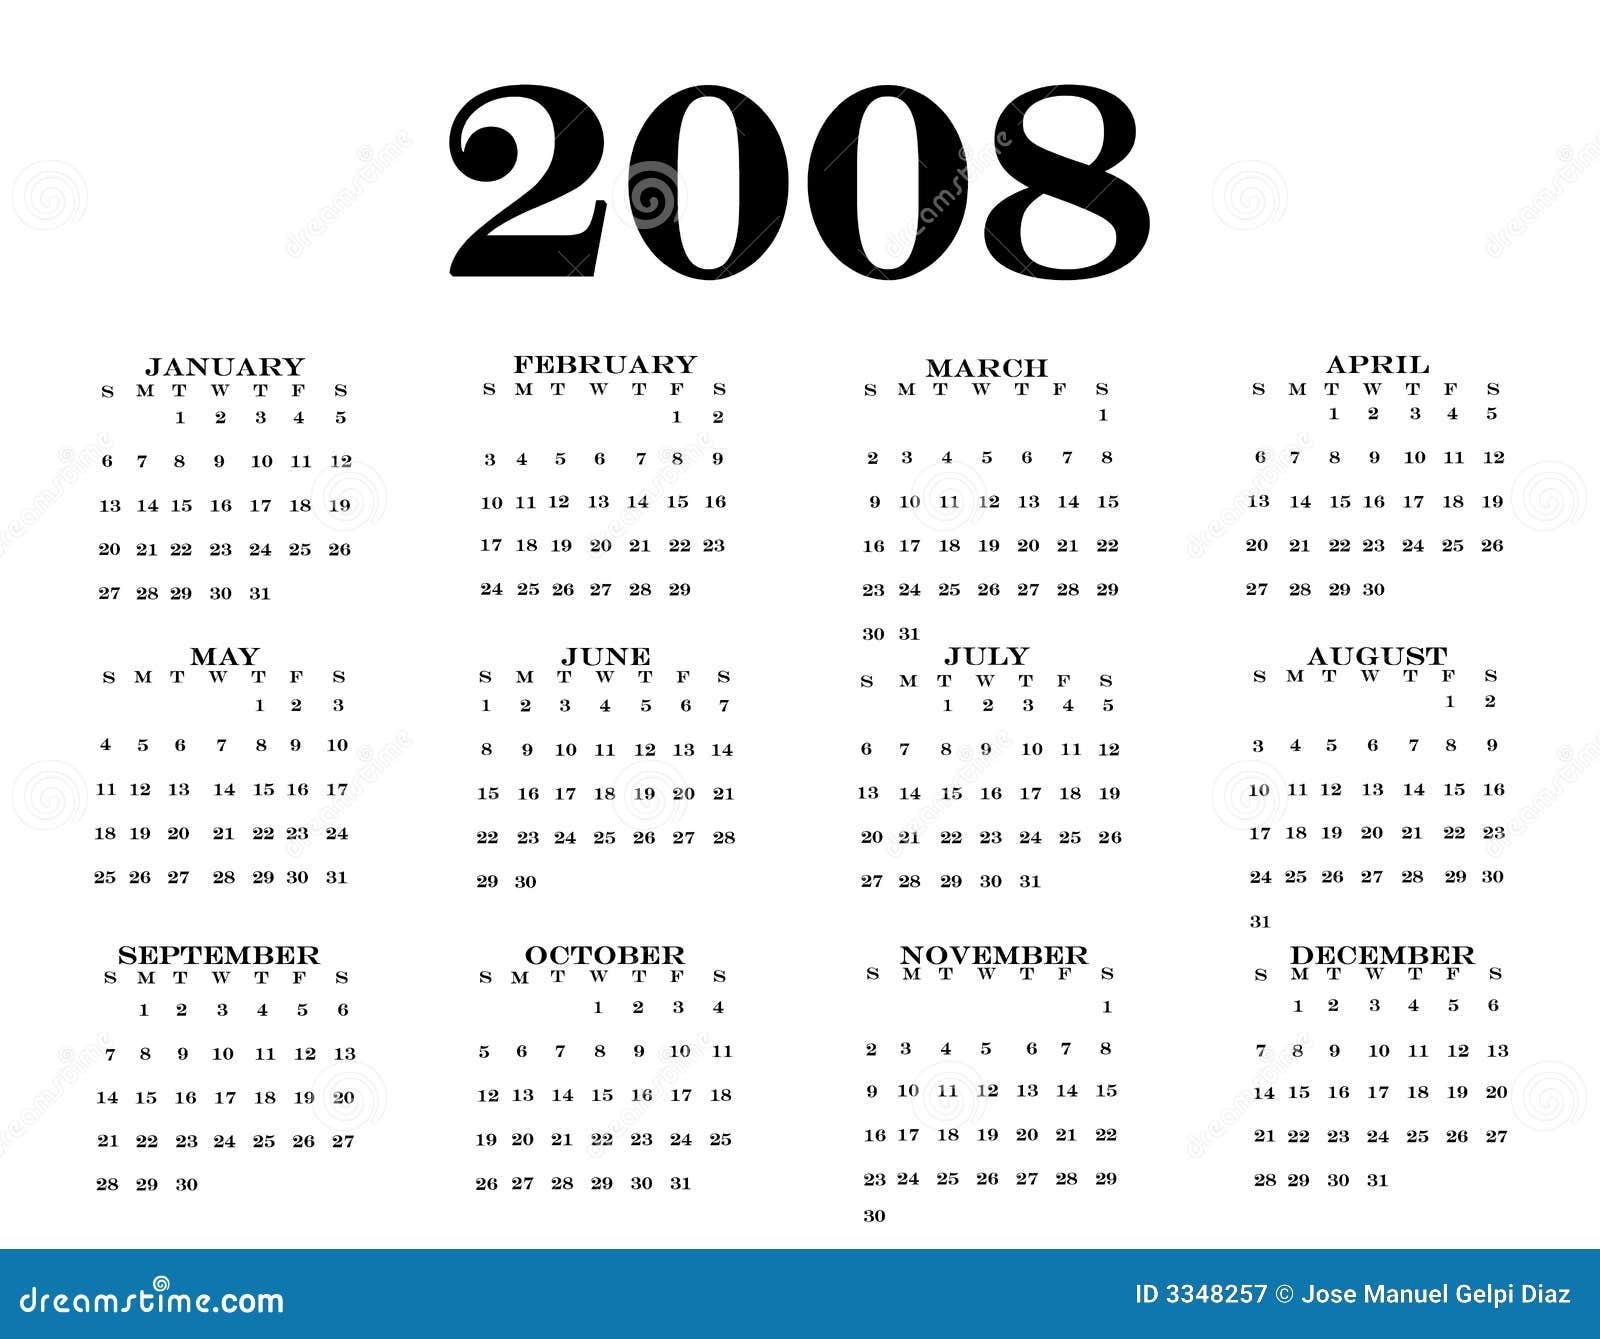 2008 Calendar Royalty Free Stock Photography - Image: 3348257